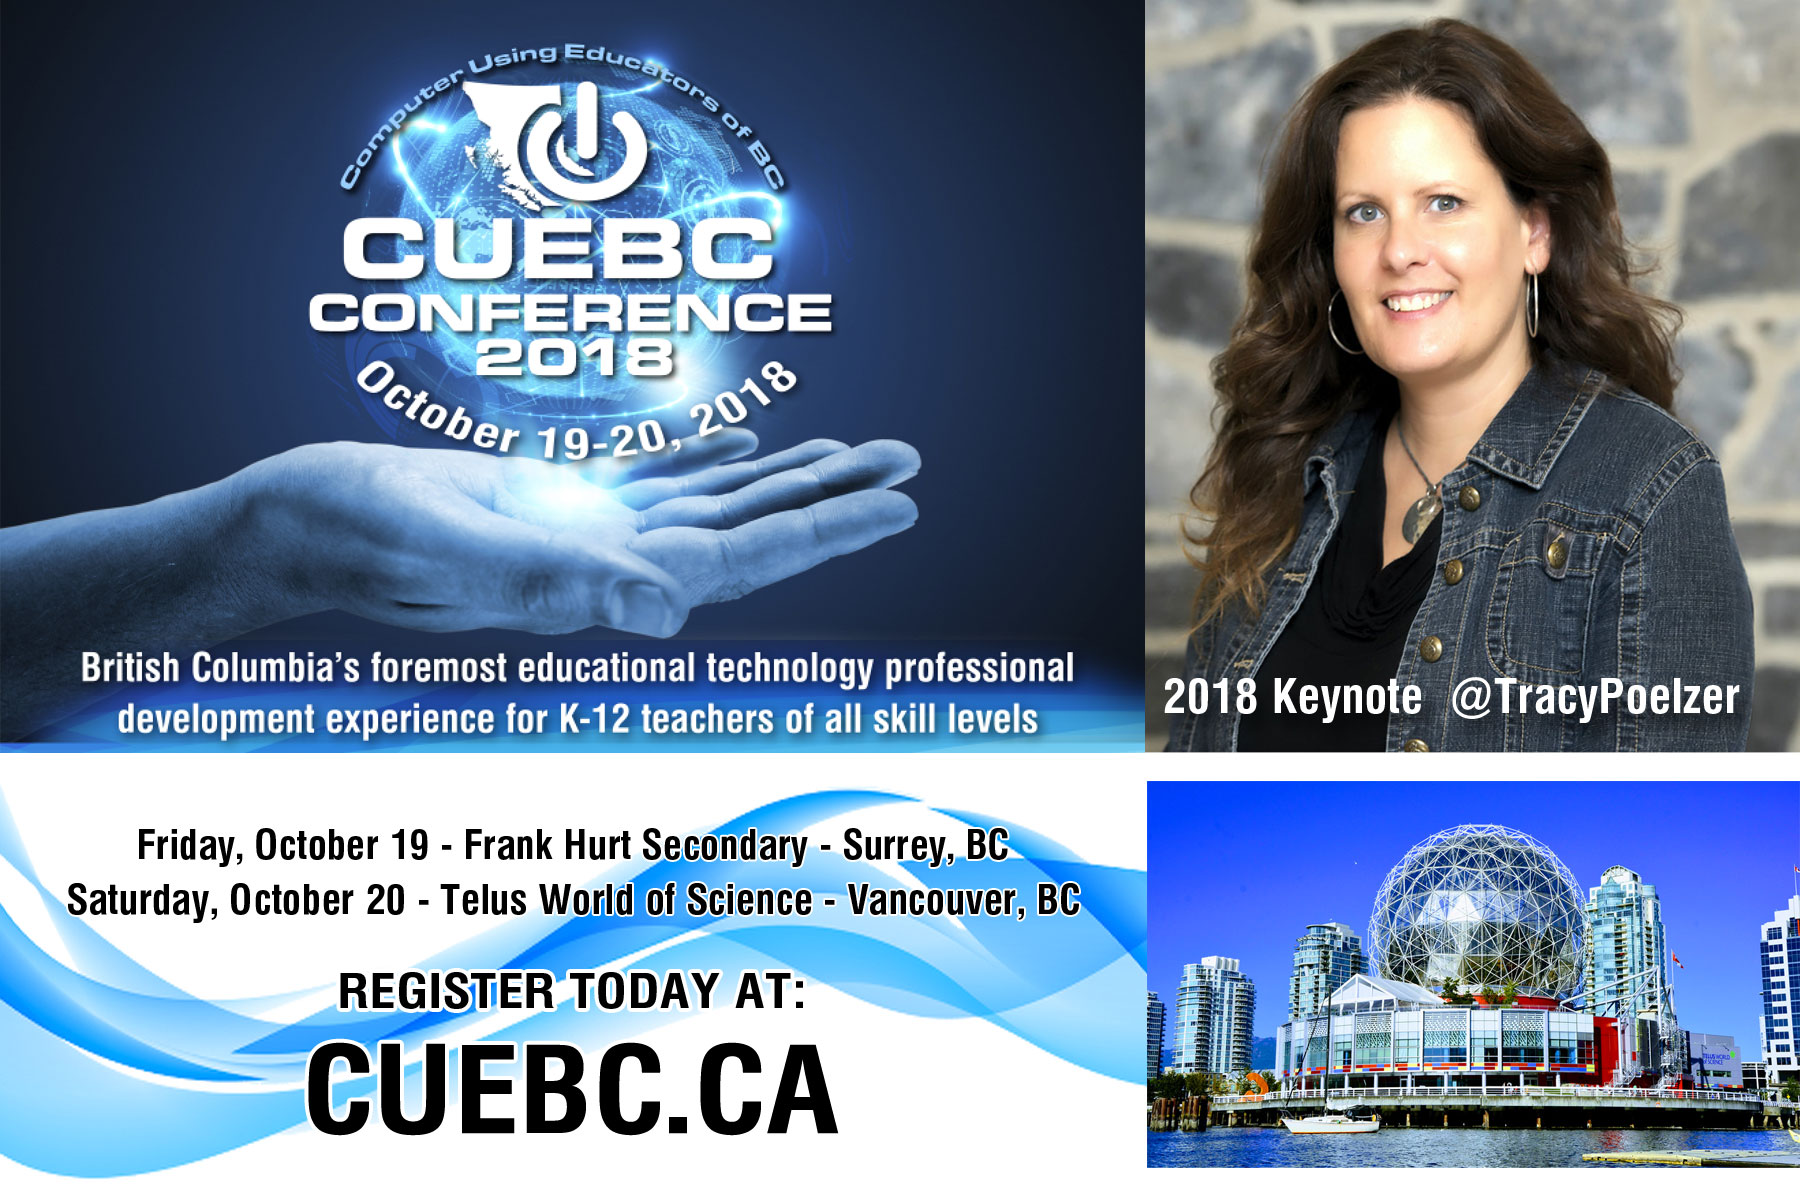 CUEBC Conference 2018